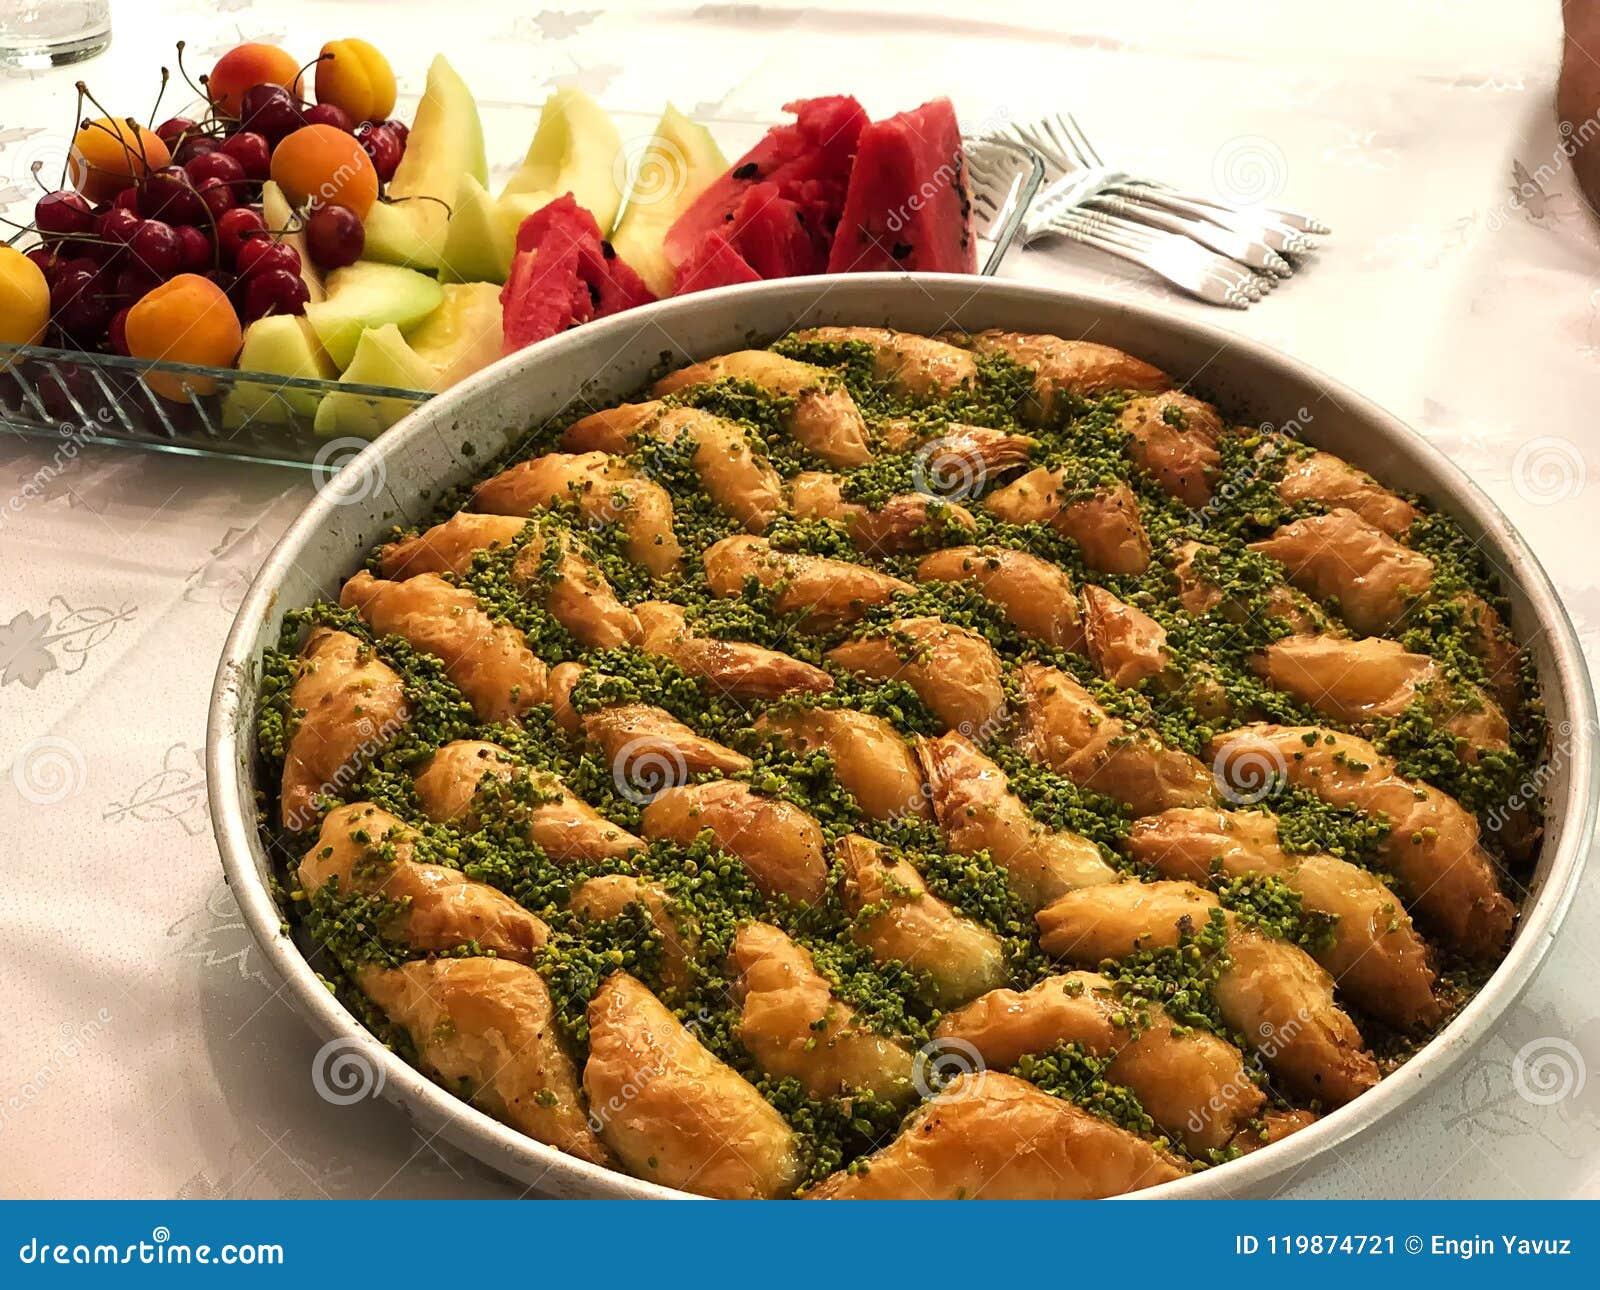 Baklava en Vruchten Turks belangrijk dessert